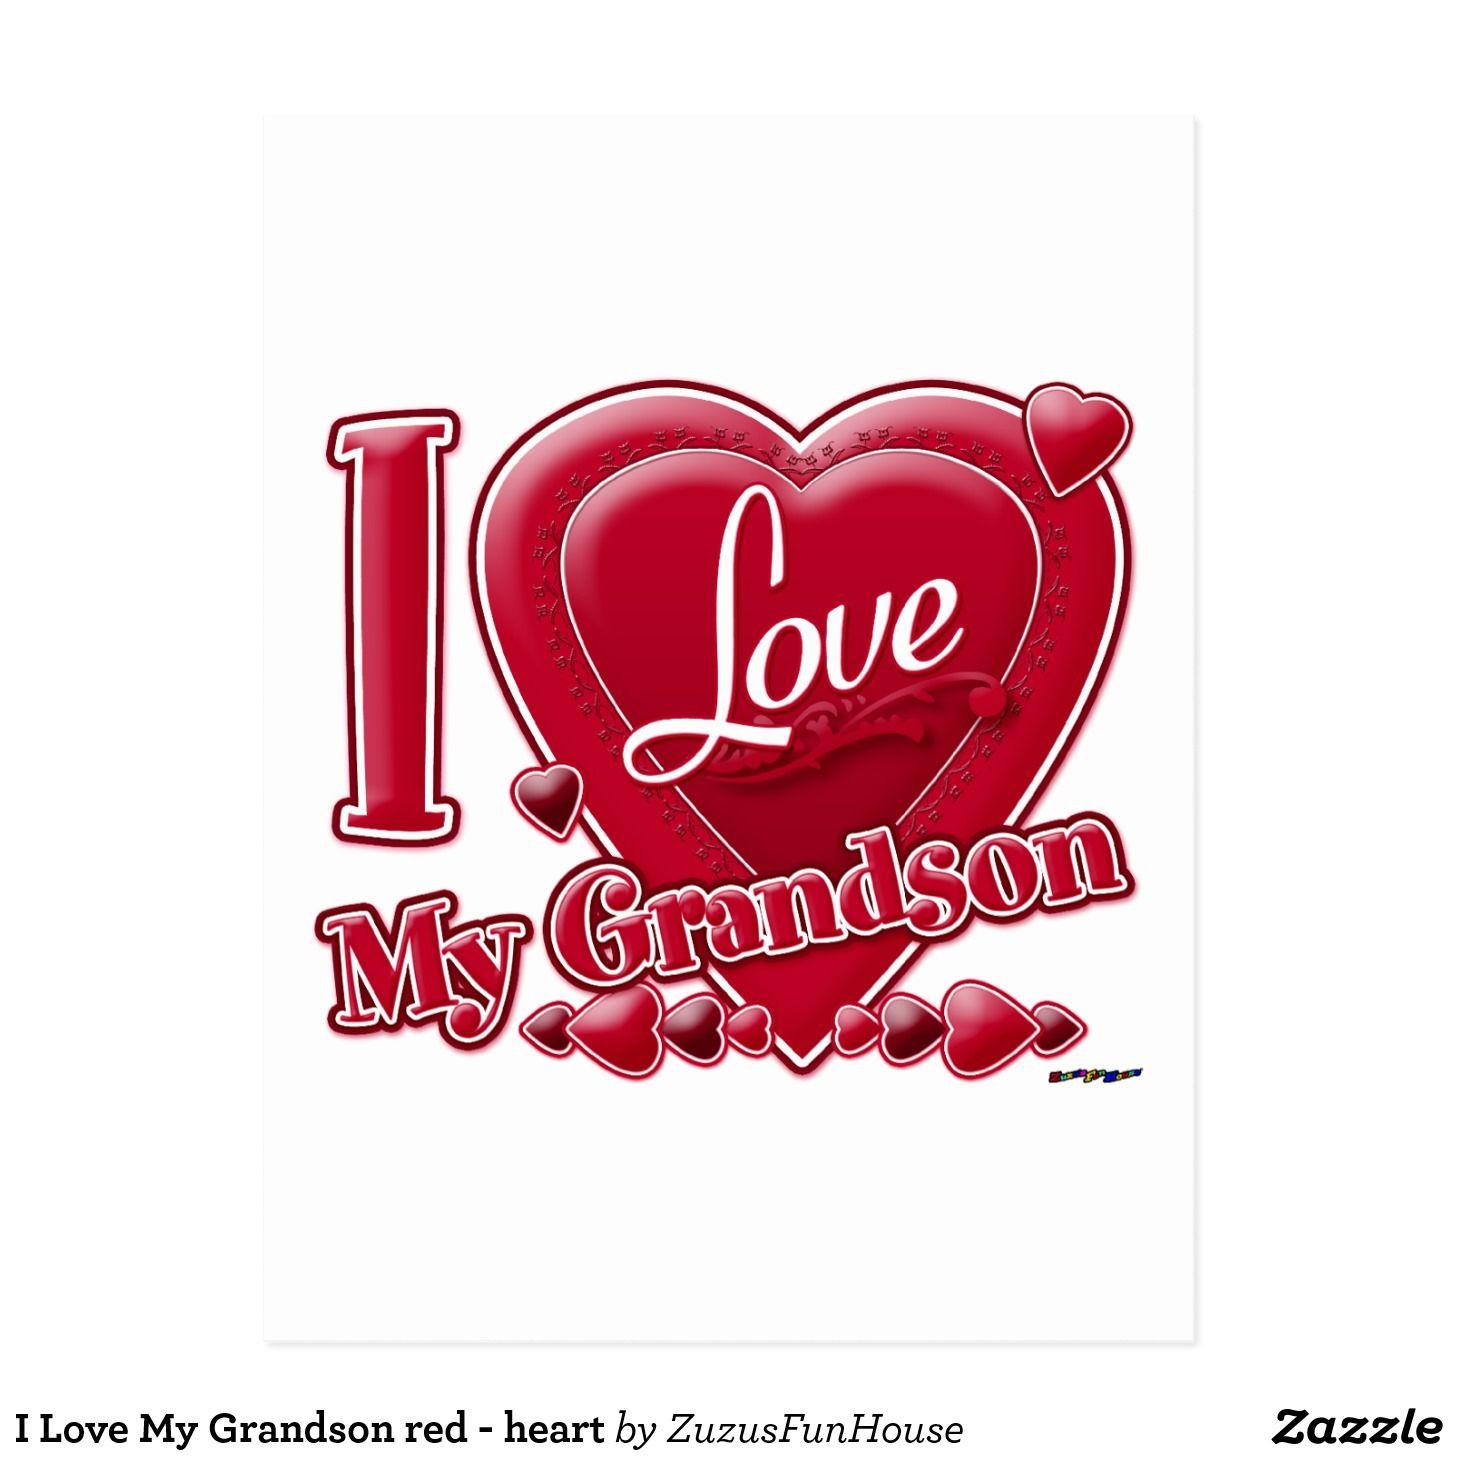 I Love My Grandson red – heart Postcard | Zazzle.com